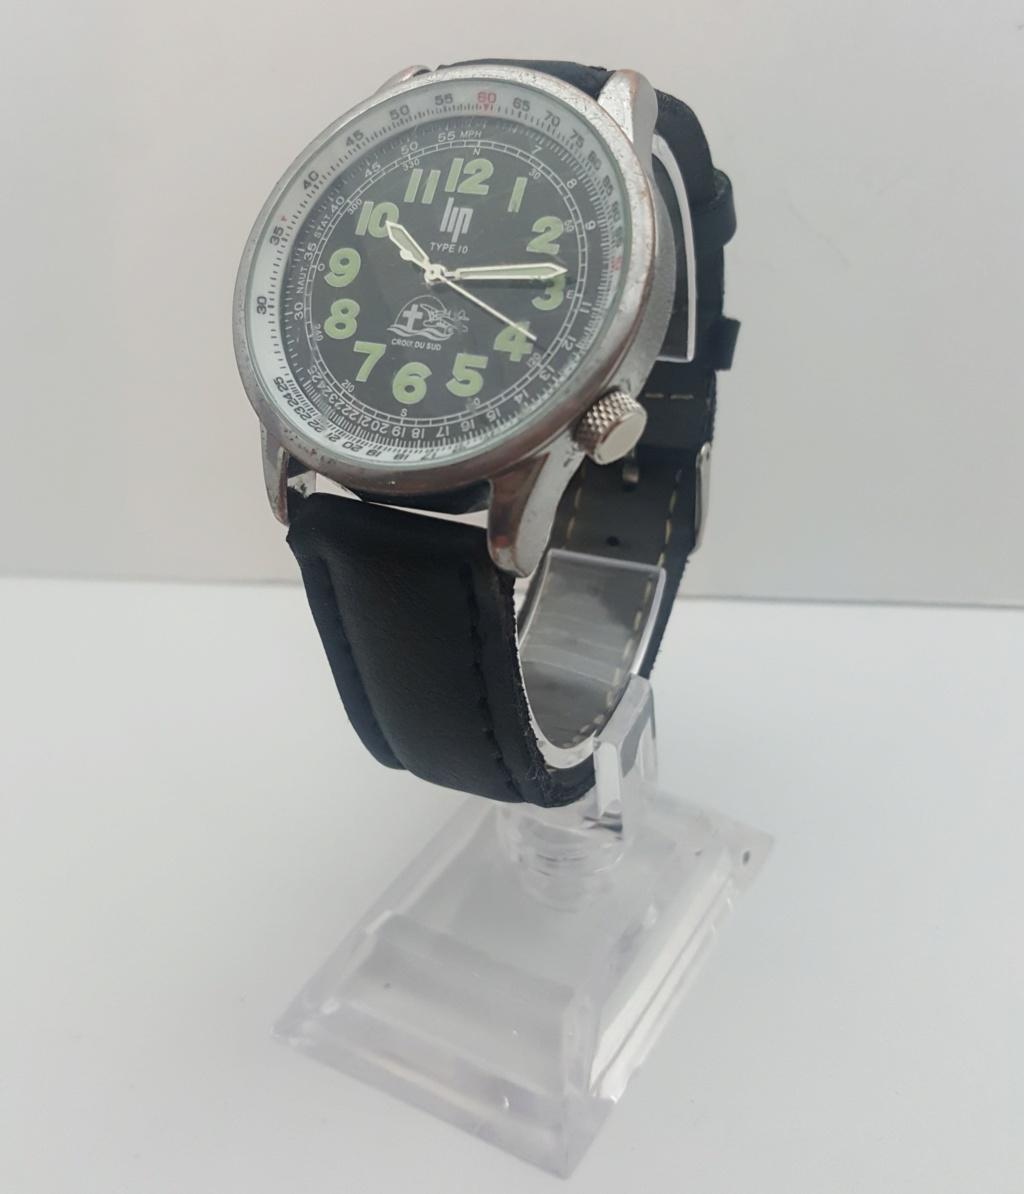 [Vendido] Relógio  LIP Type 10 Croix du Sud/Jean Mermoz Edt. - 100% OK 0115